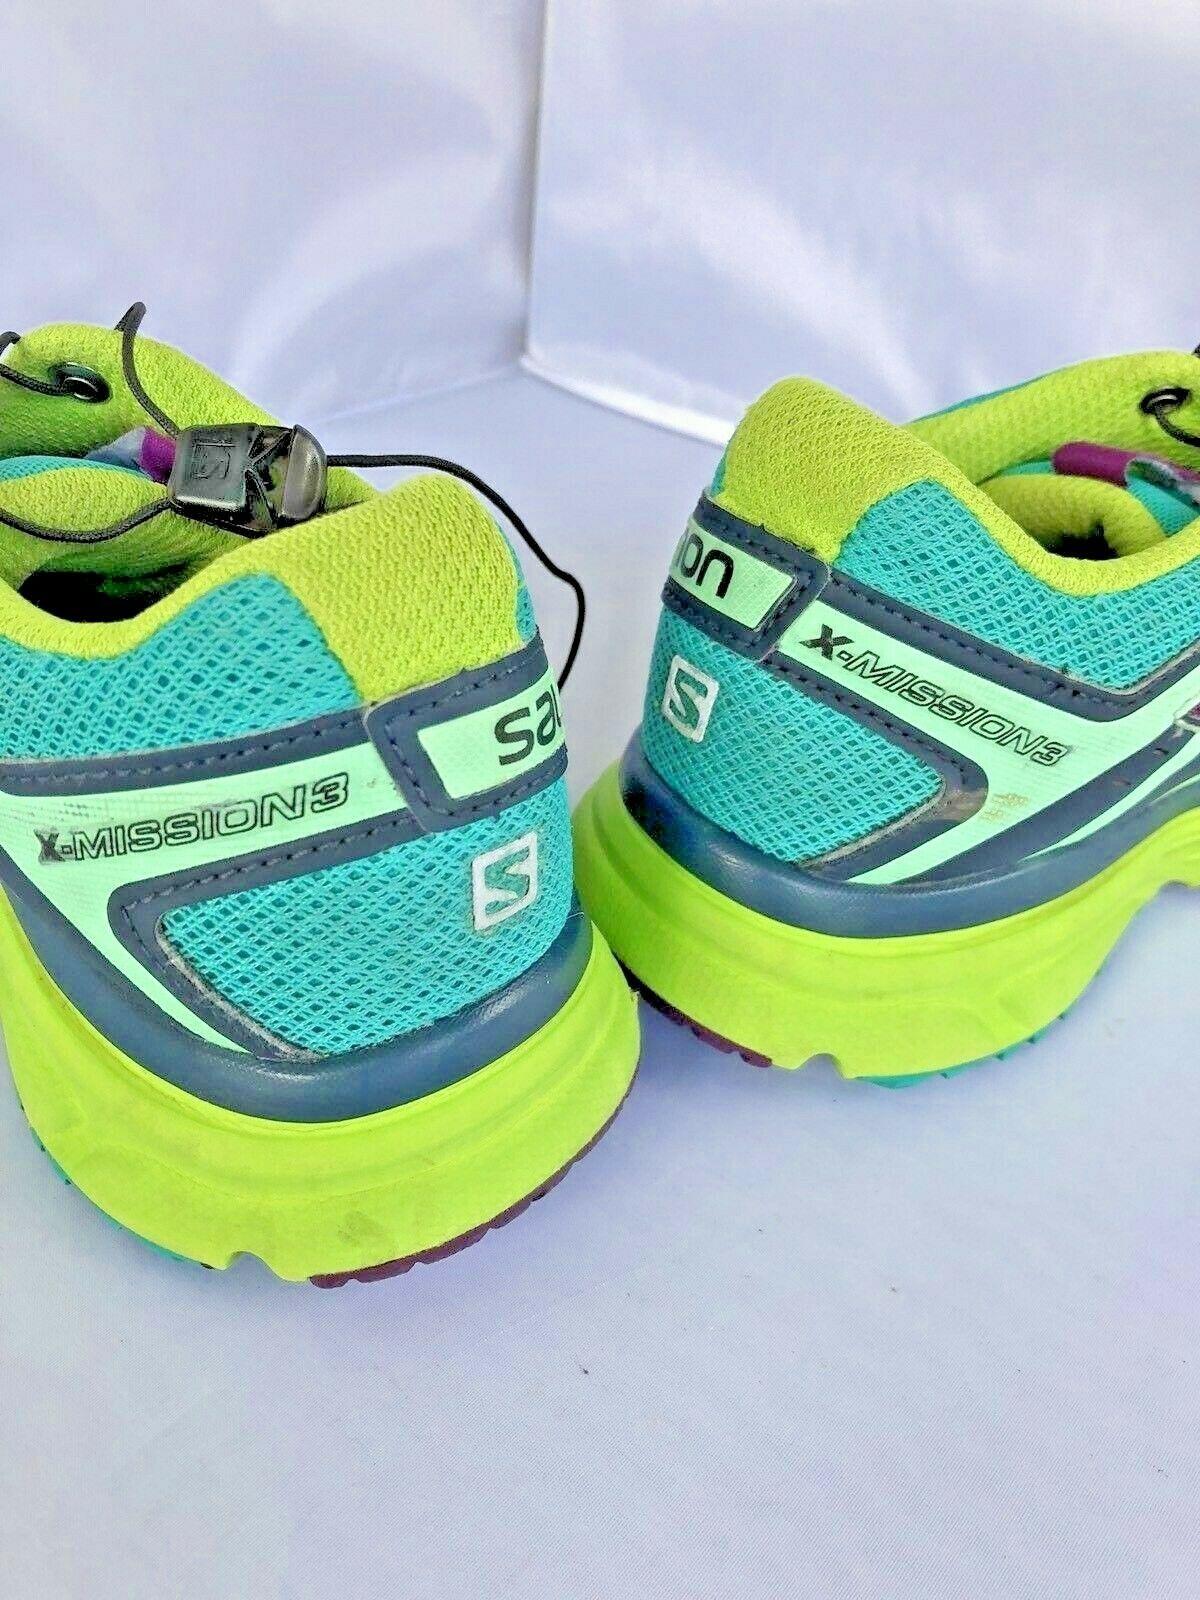 Salomon X Mission 3 Hiking Shoes Size 8 Breathable Running Contagrip Sensifit image 6